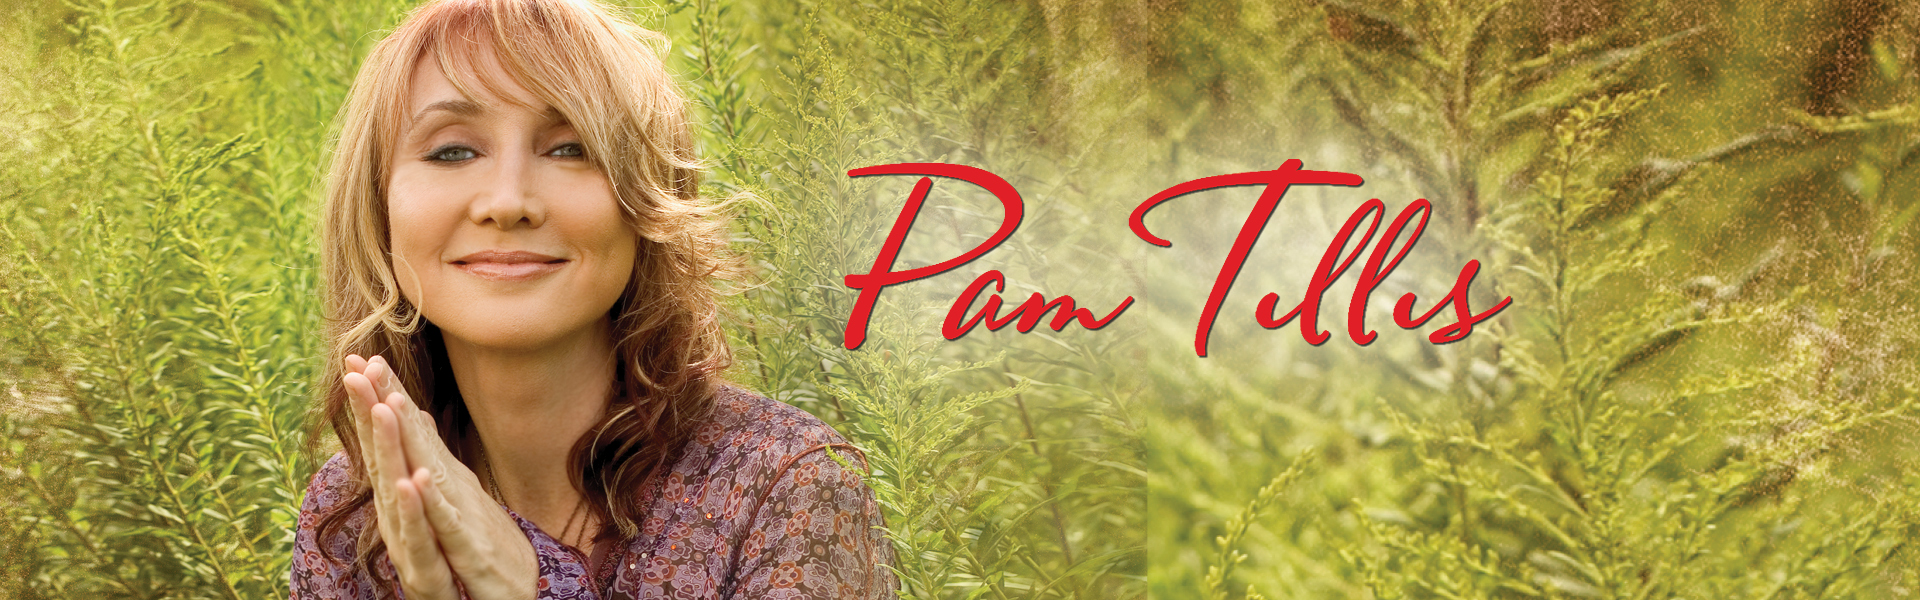 Picture of Pam Tillis